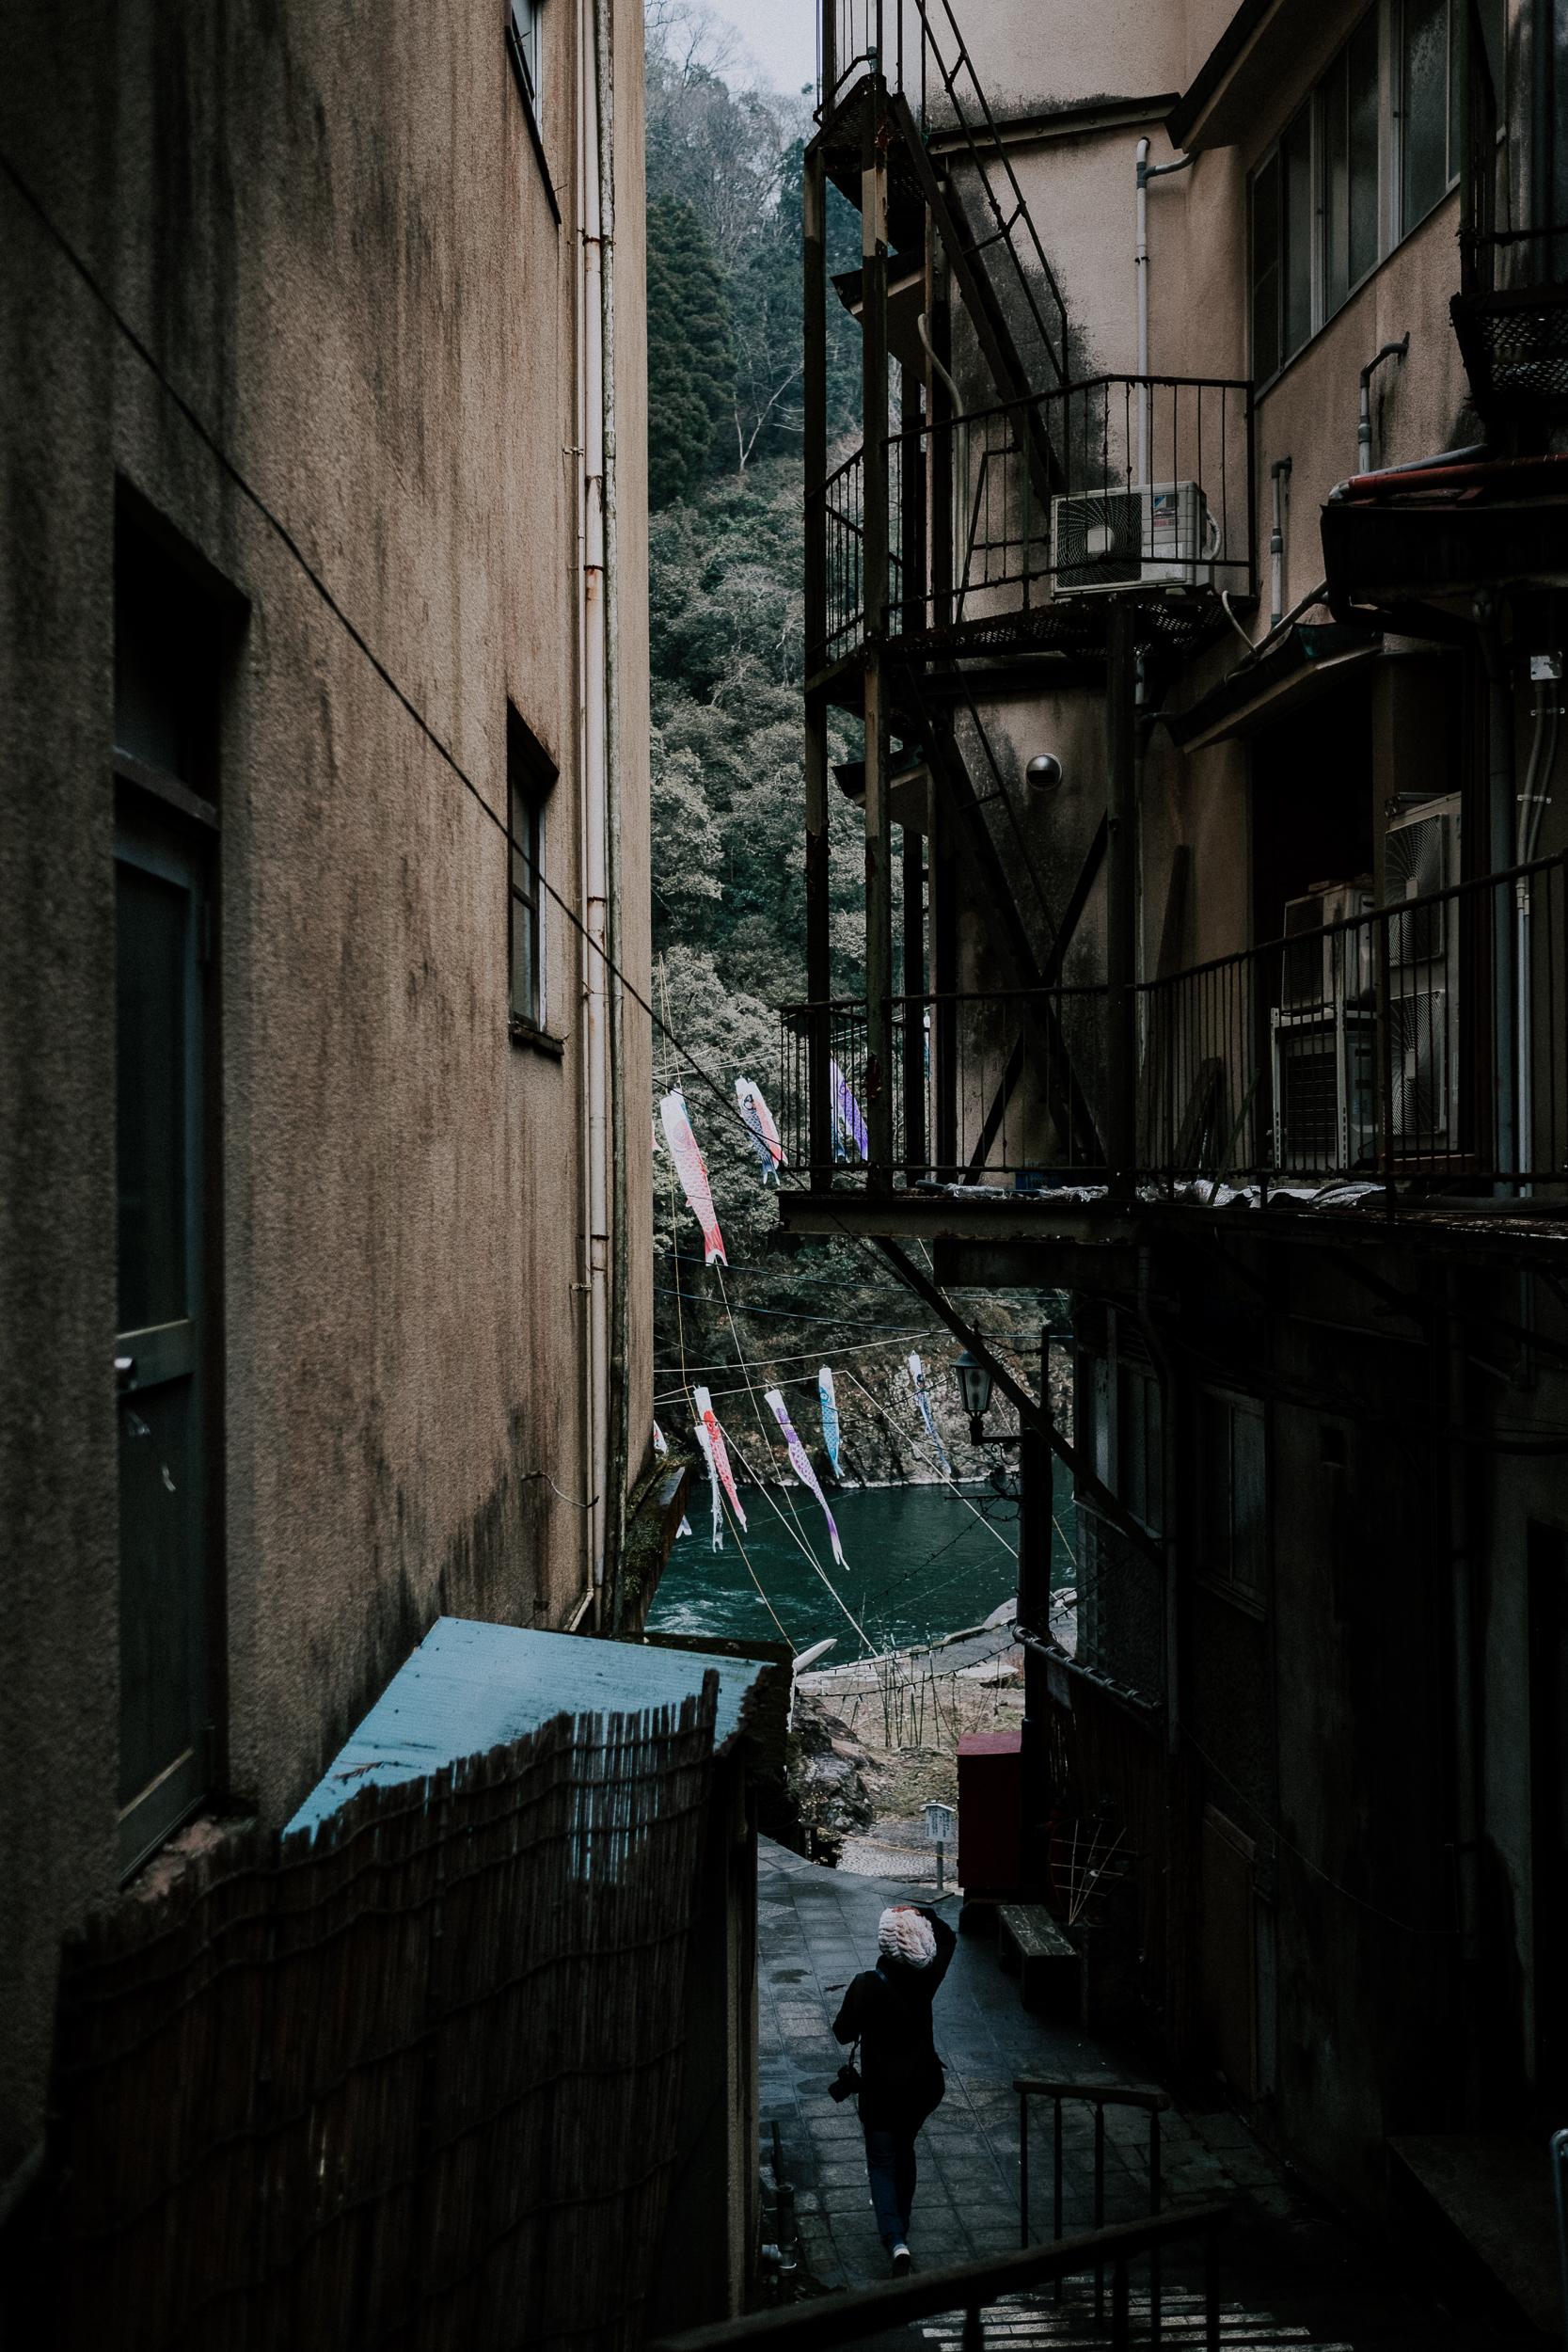 Slyvie walking through the streets of Tsuetate.